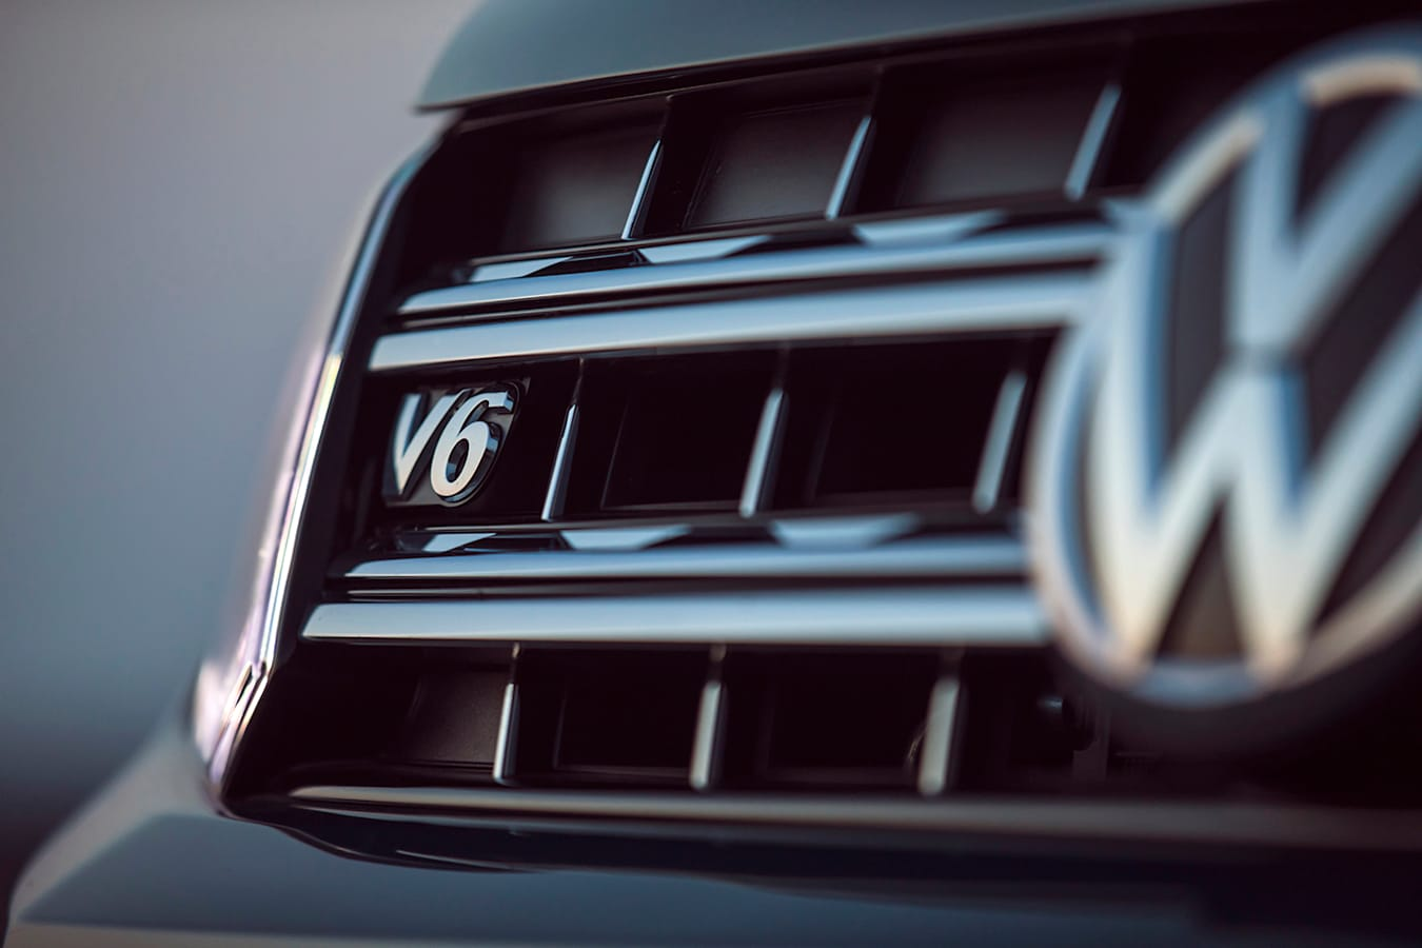 2019 VW Amarok 580 Grille Detail Jpg